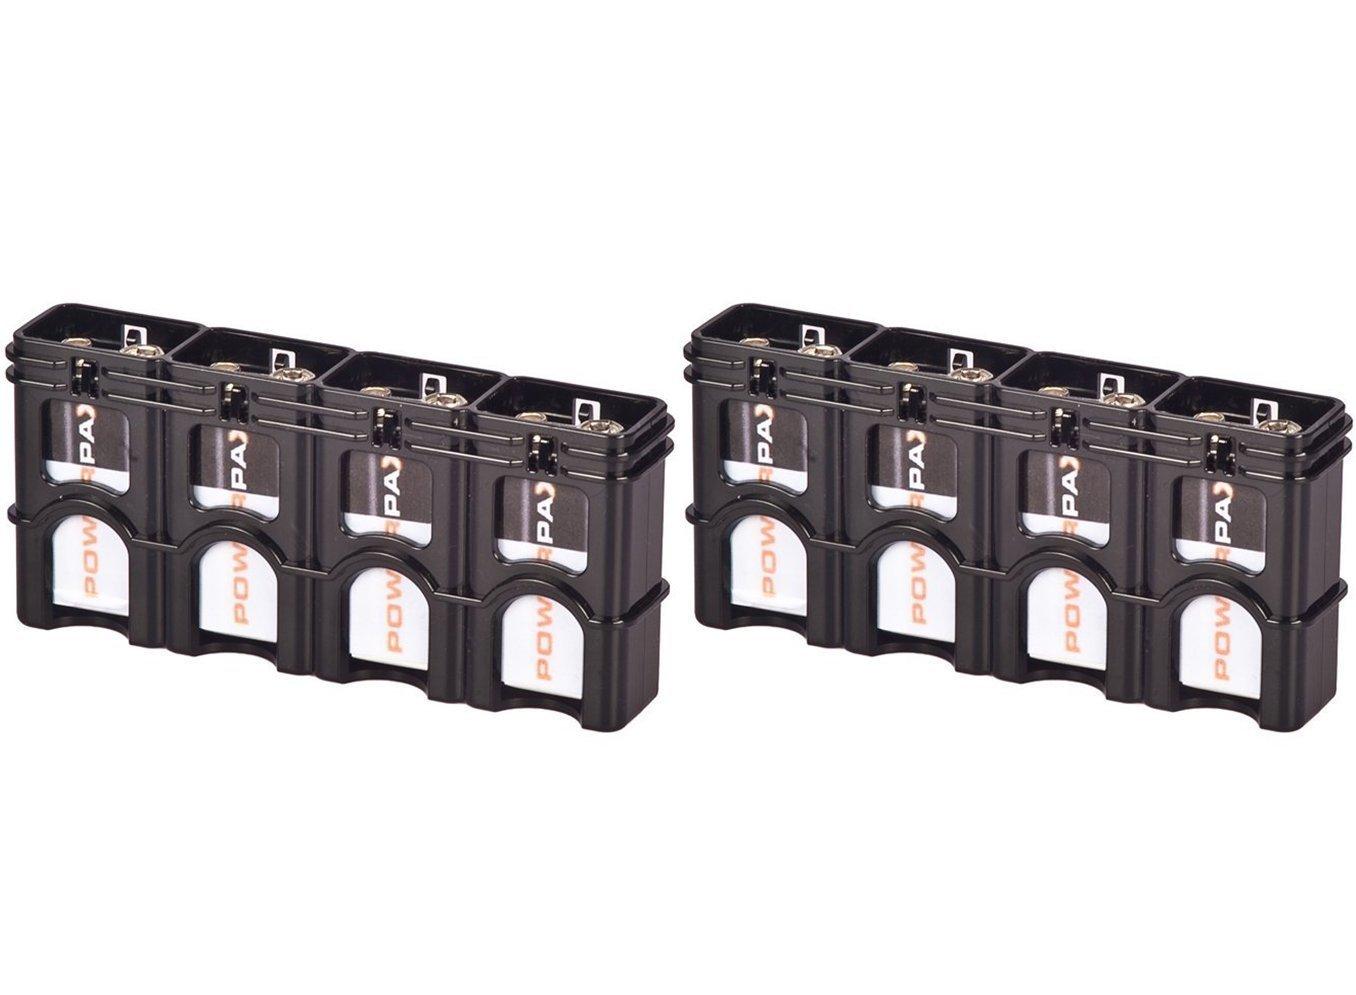 Black Each Holds 4 9V Batteries /… 2 x Powerpax Slim Line 9V Battery Caddy